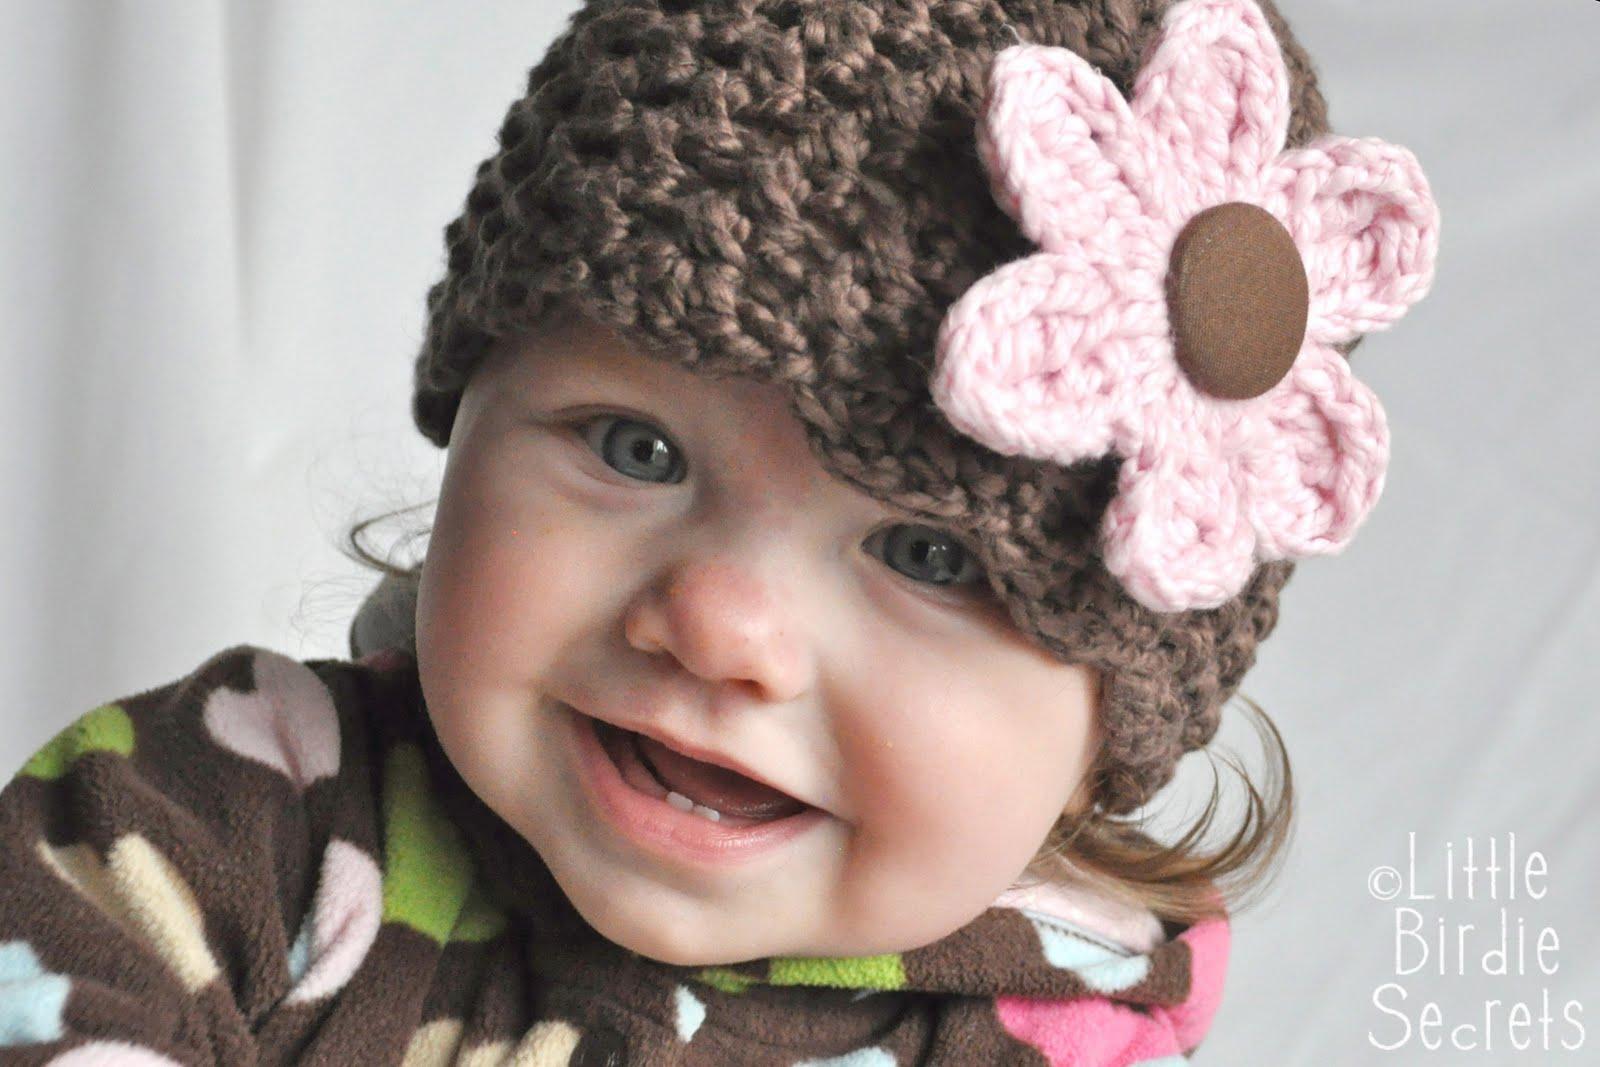 http://4.bp.blogspot.com/_VatJ9ty_tJ0/TMZz5Tre2MI/AAAAAAAAHBA/QBka9_tD-JU/s1600/crocheted%2Bava%2Bhat%2Bwith%2Bflower%2Bcloseup.jpg